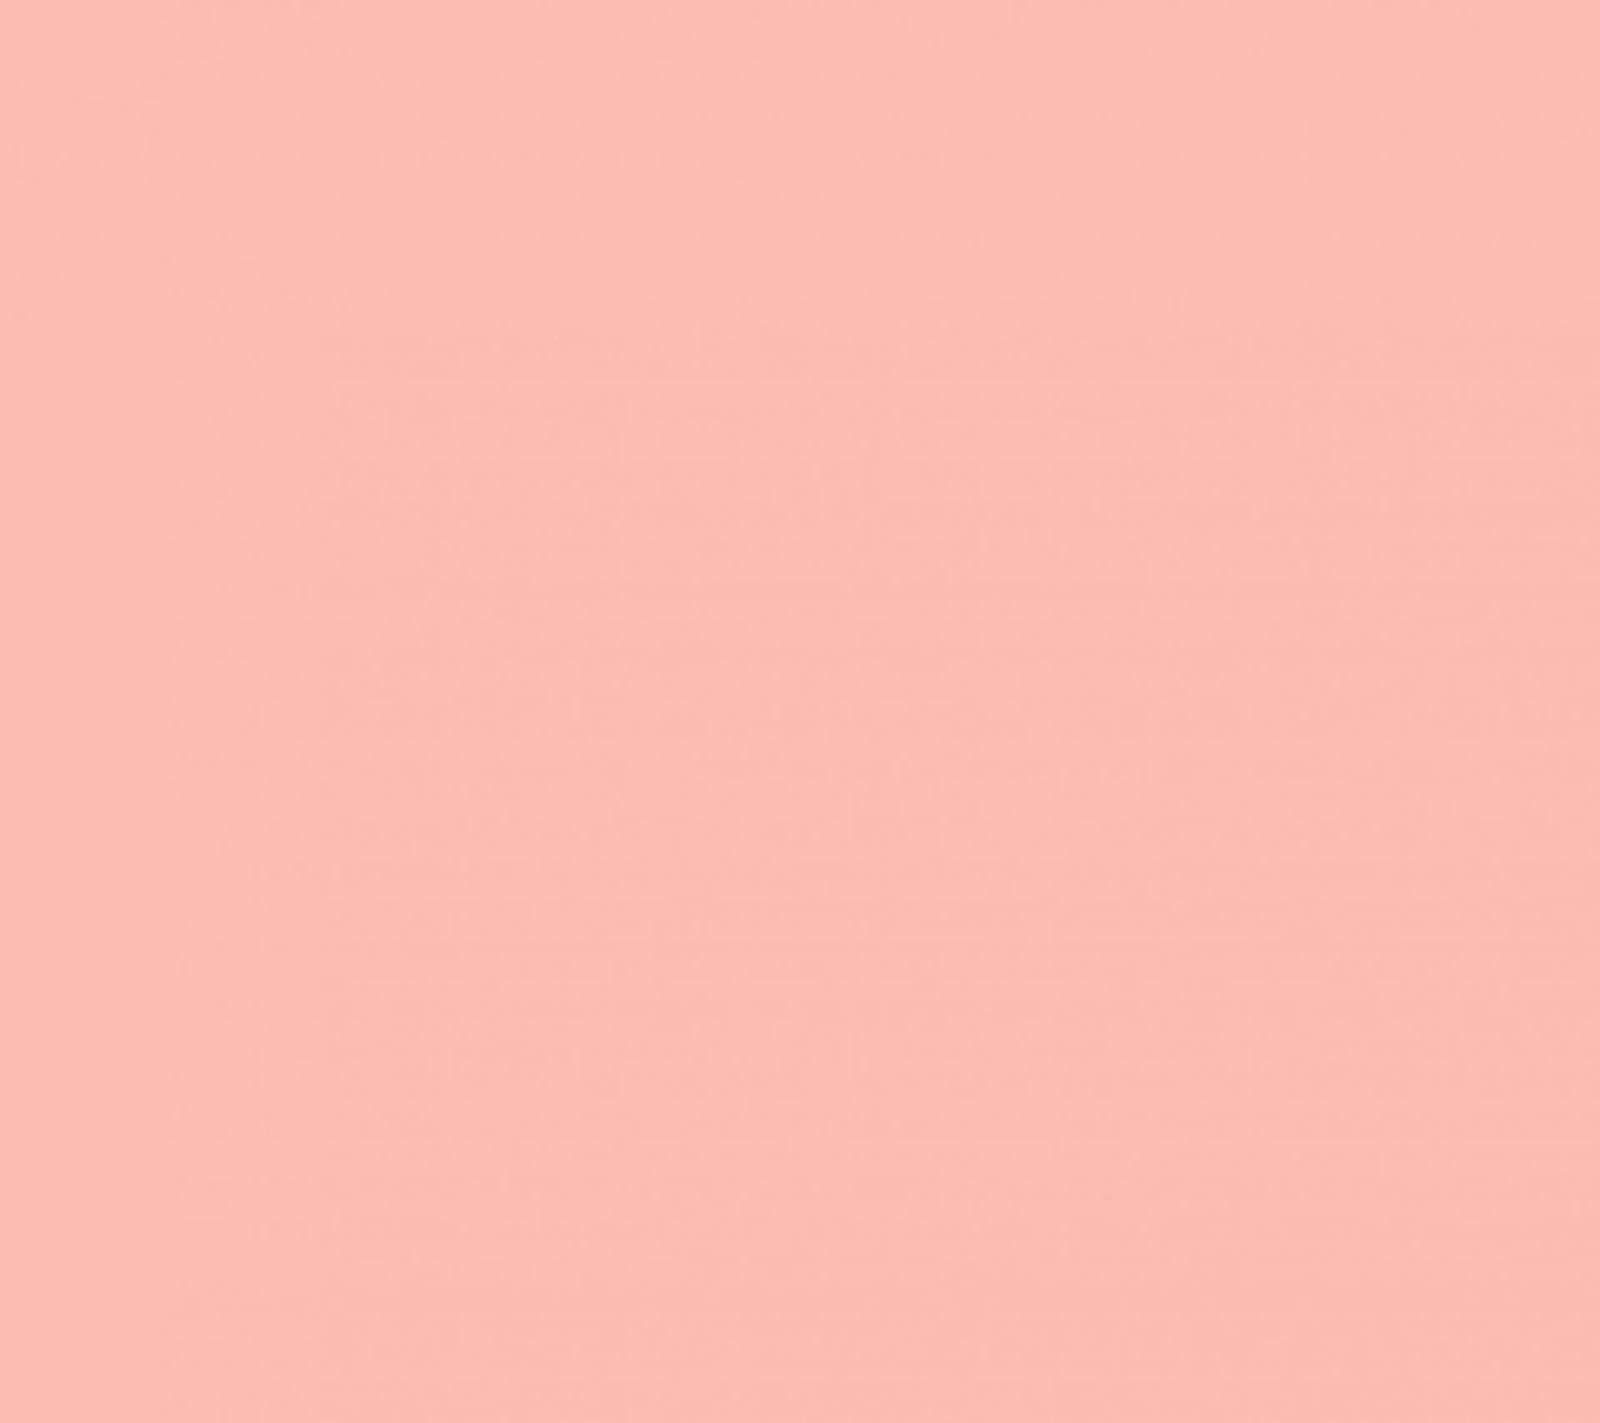 PUL rosé